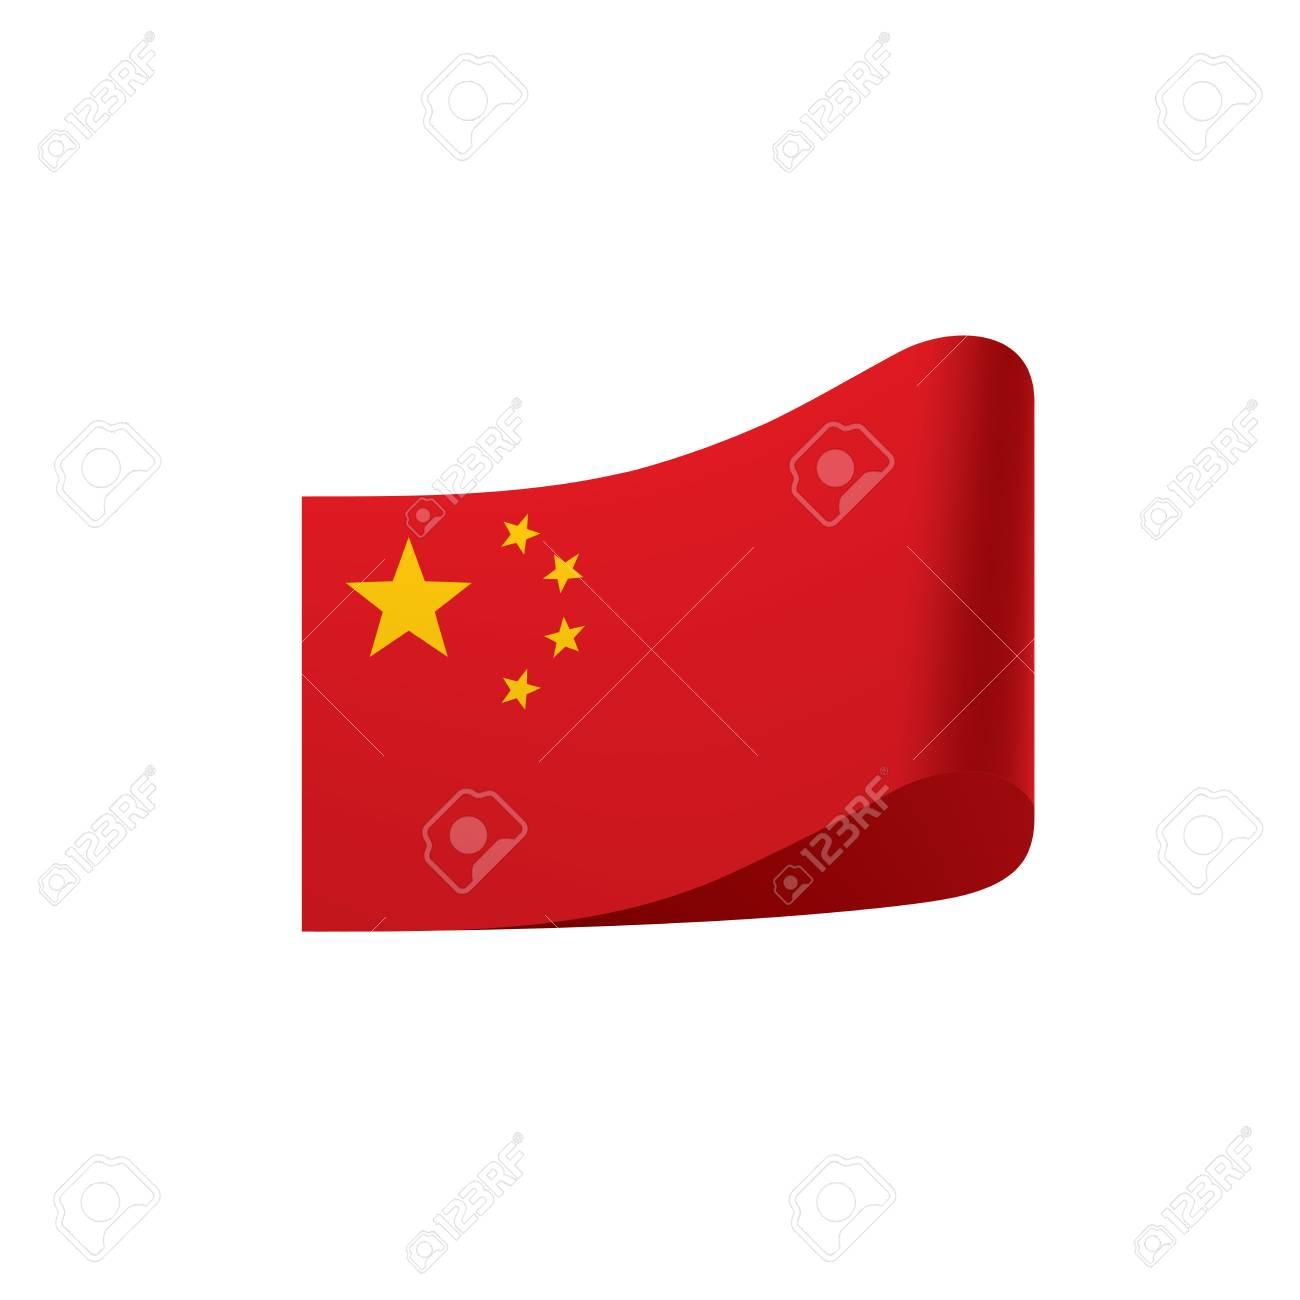 china flag vector illustration royalty free cliparts vectors and rh 123rf com China America Flag Vector china flag icon vector